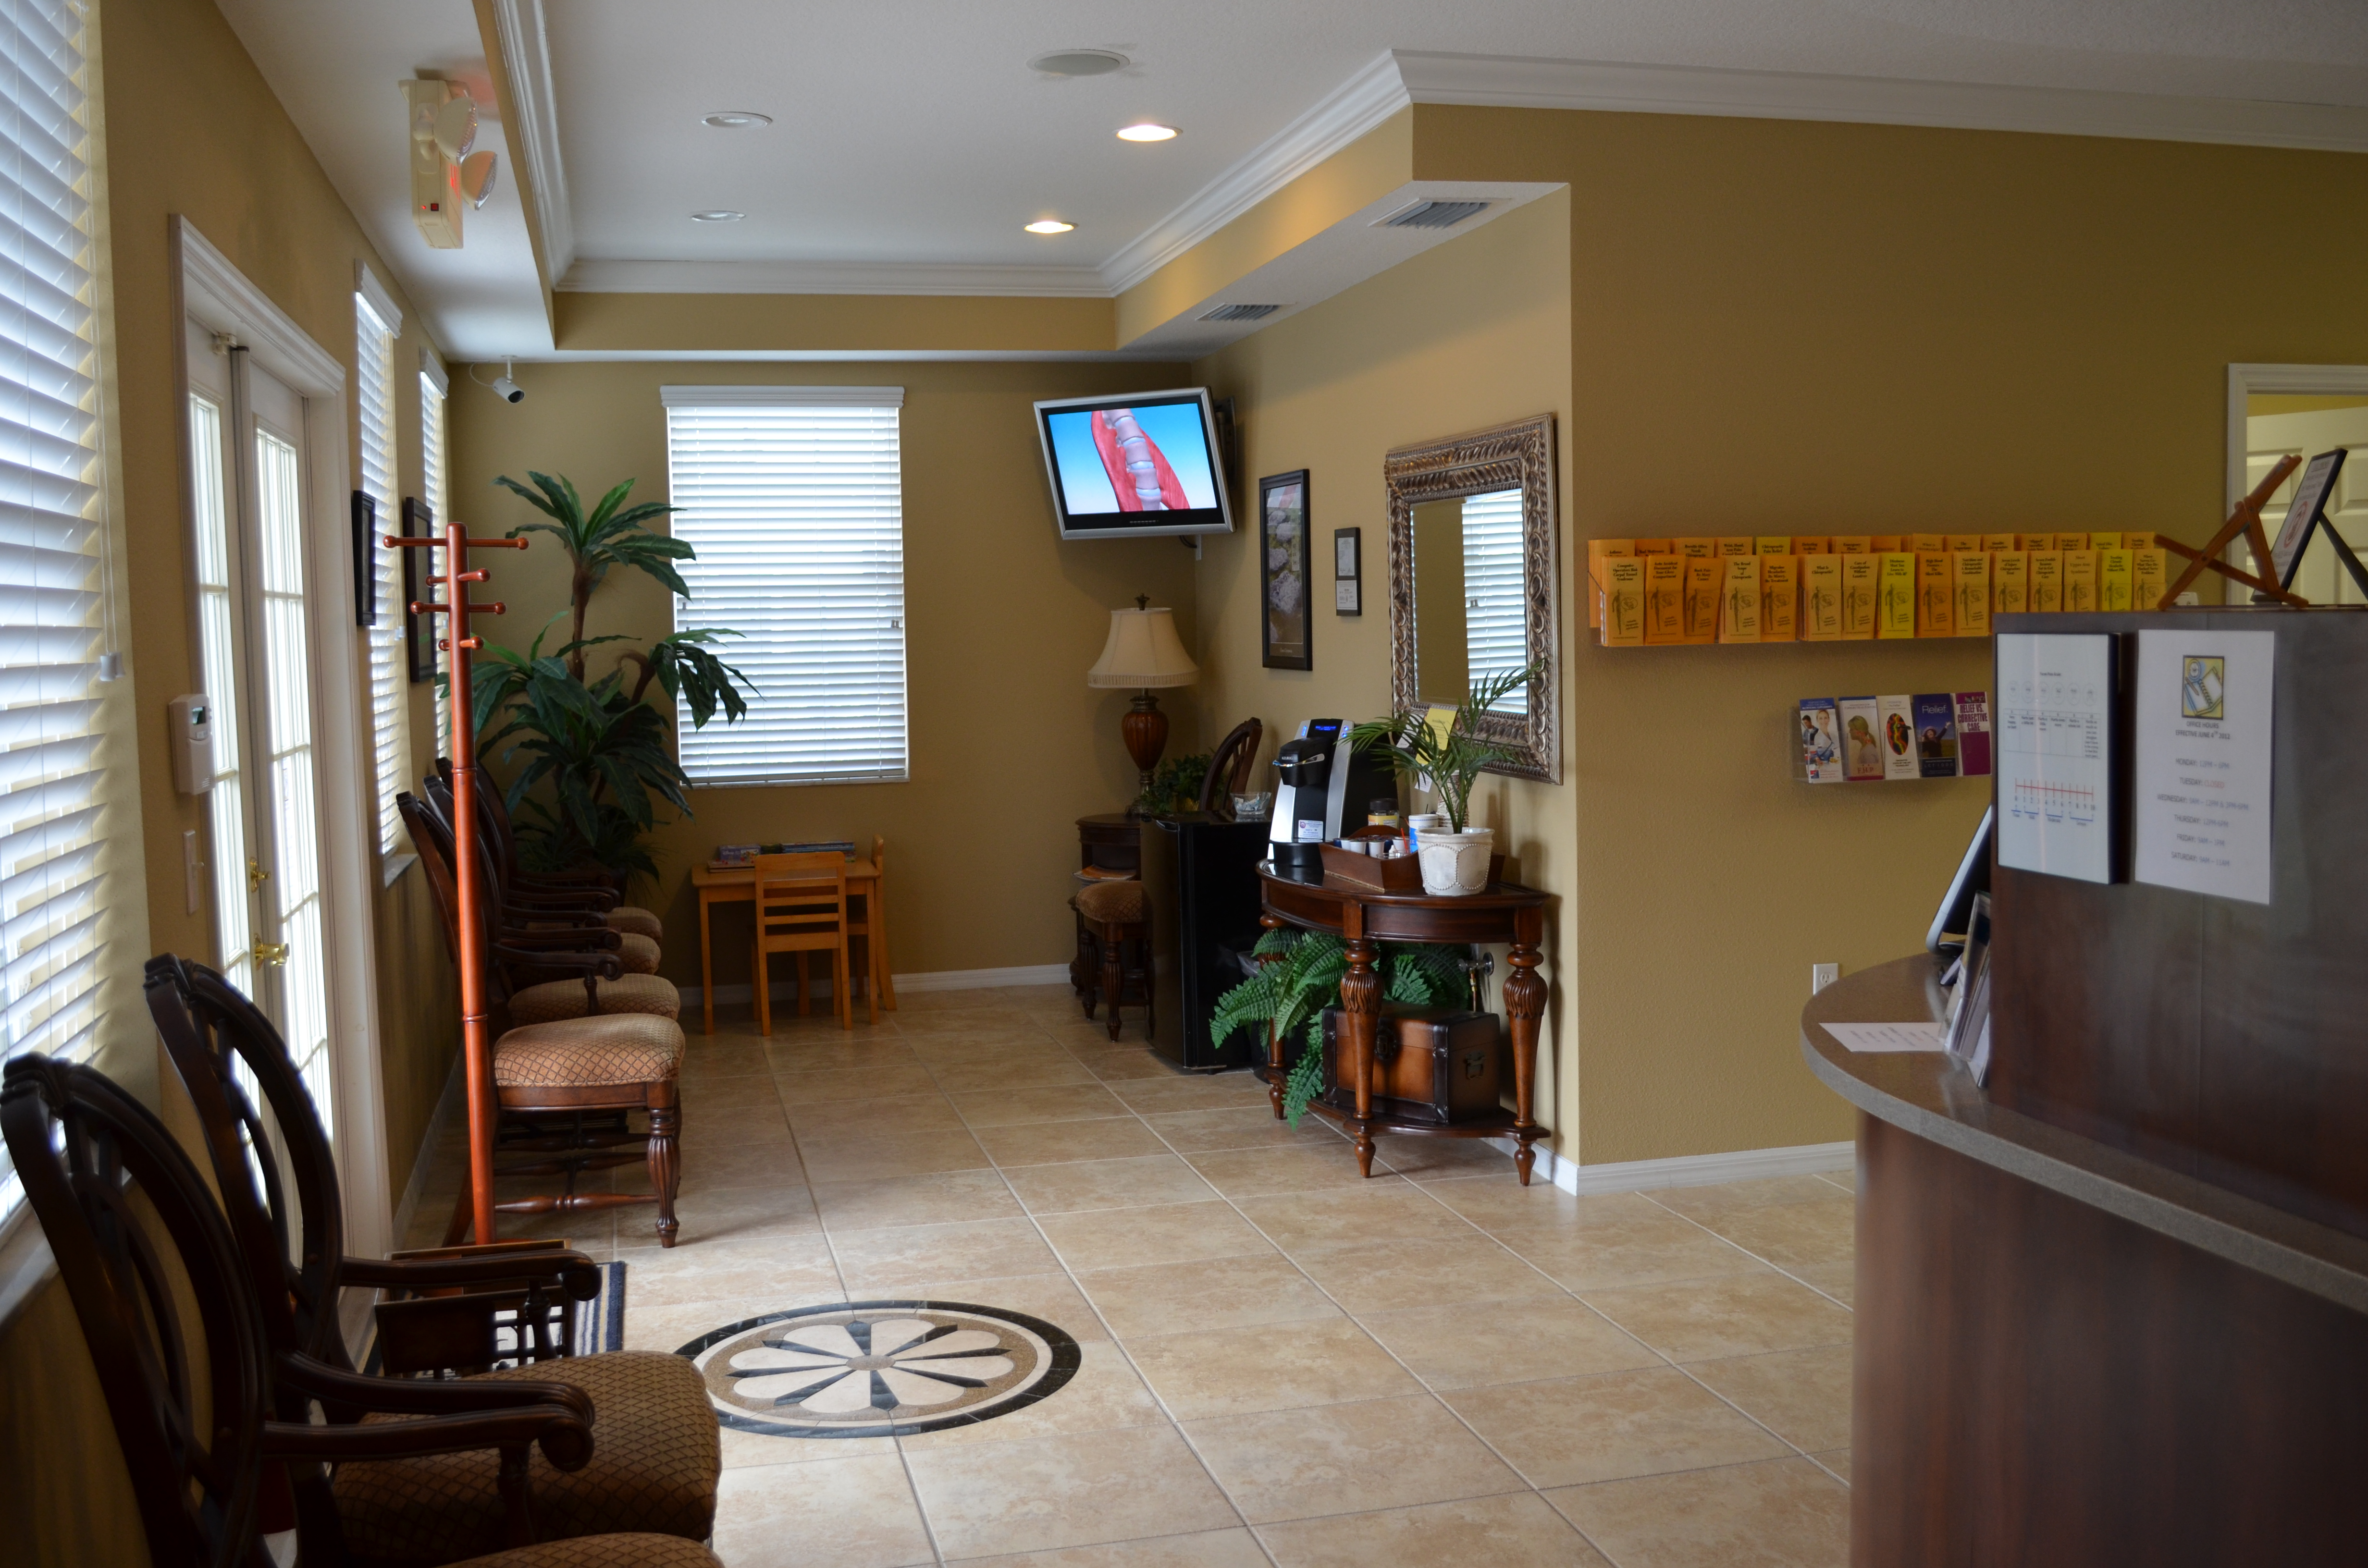 Wesley Chapel Chiropractor Waiting Area